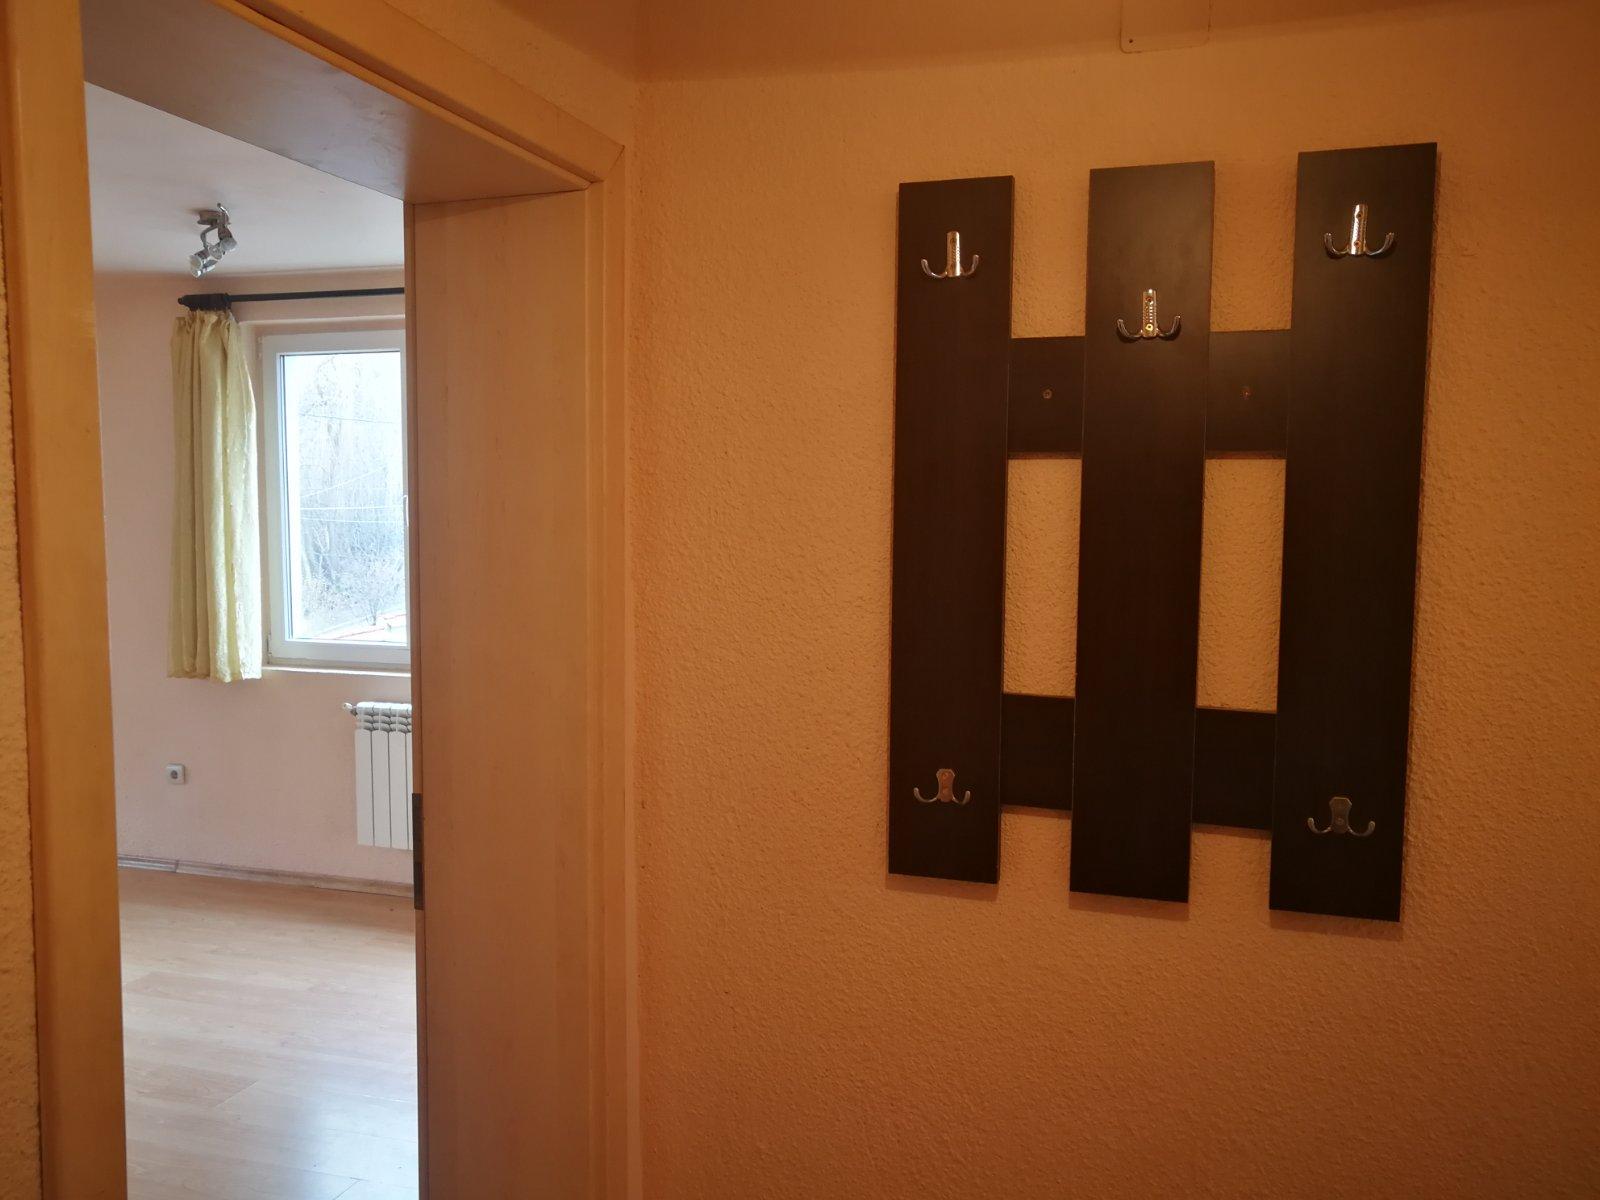 Двустаен апартамент под наем в Бистрица